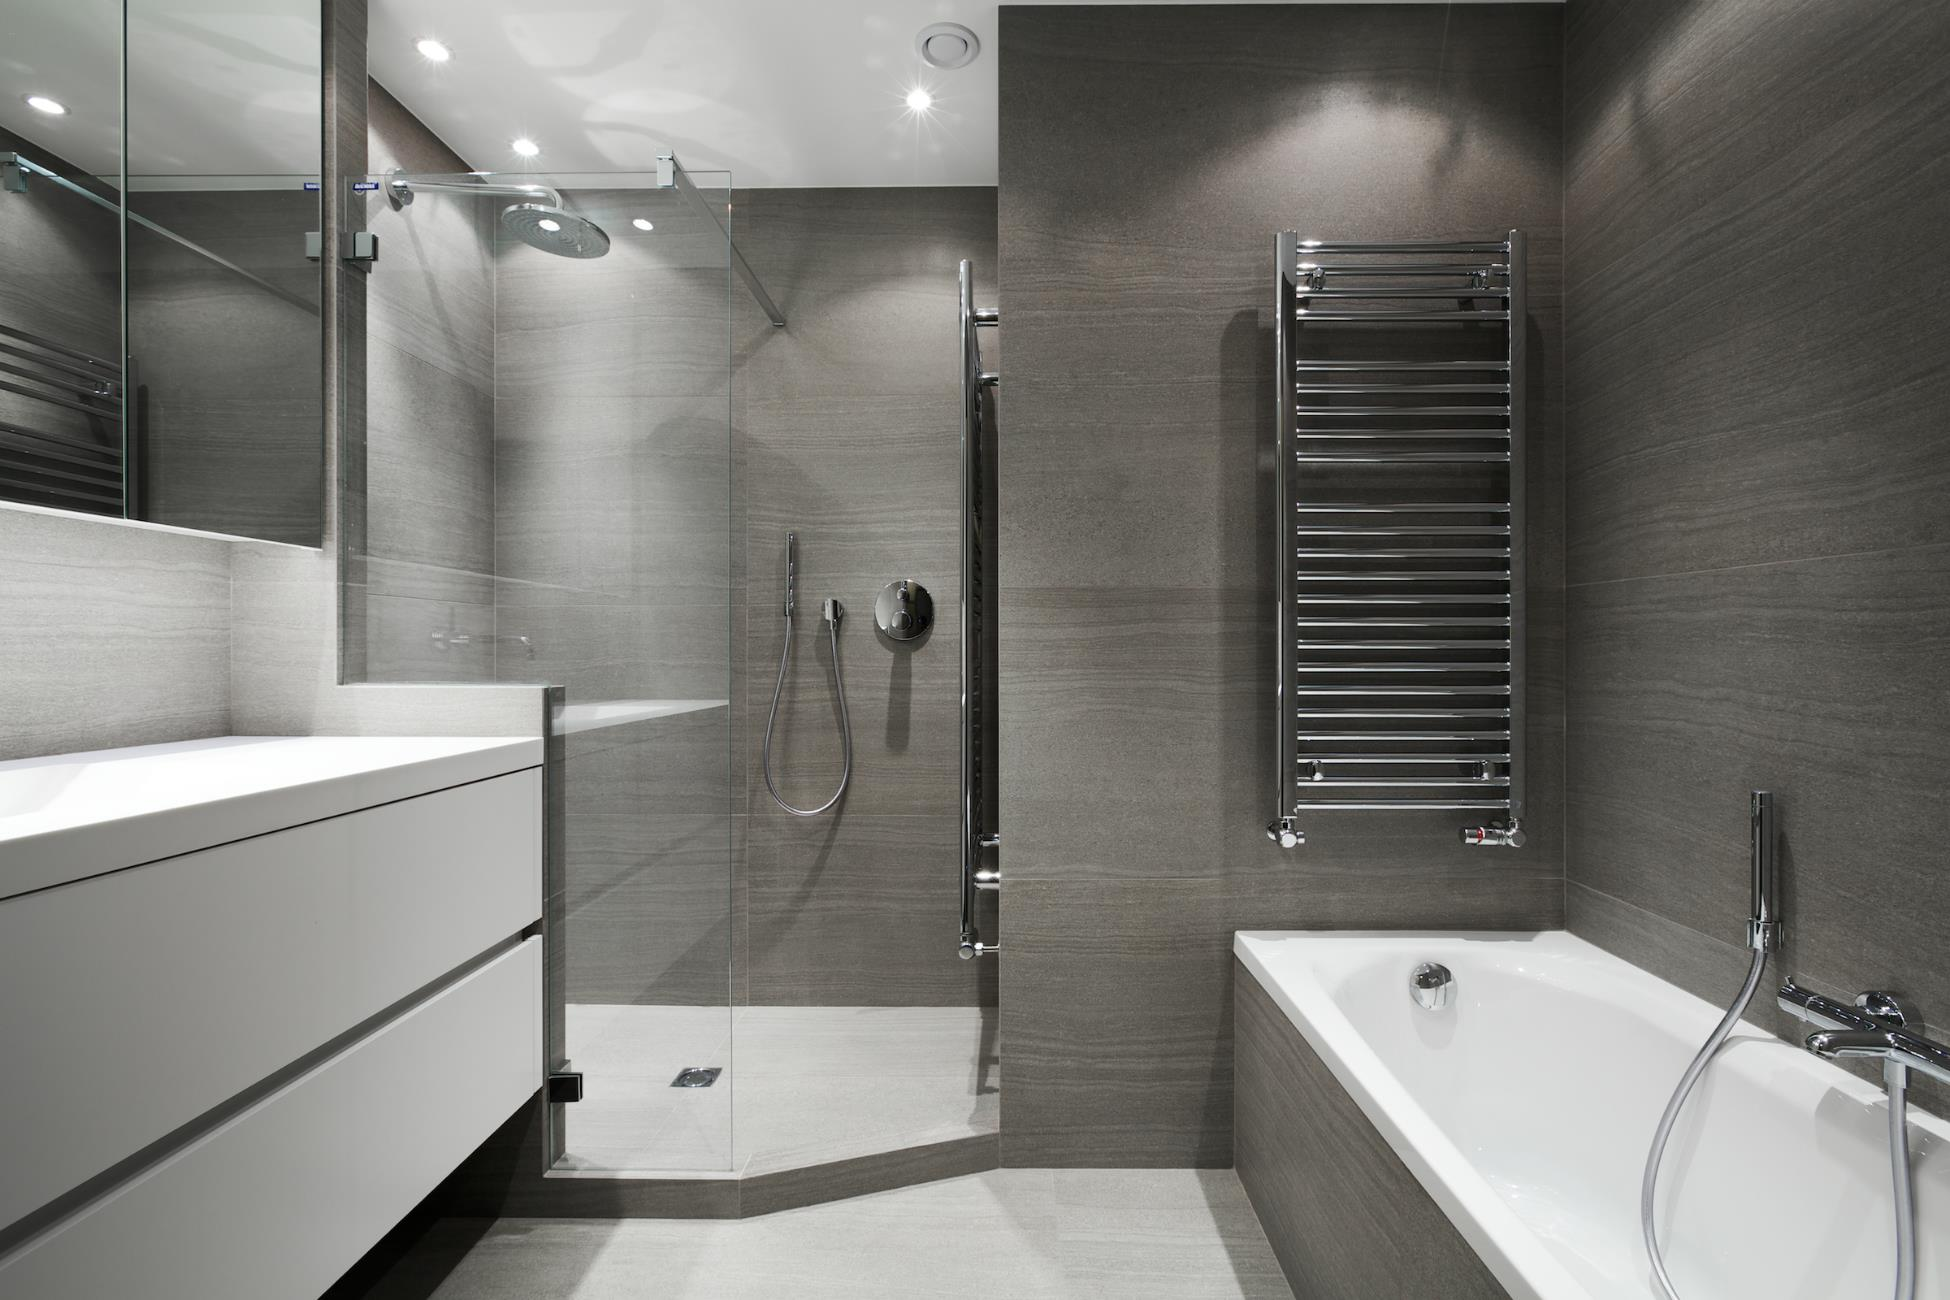 Petite salle de bain douche italienne for Petite salle bain